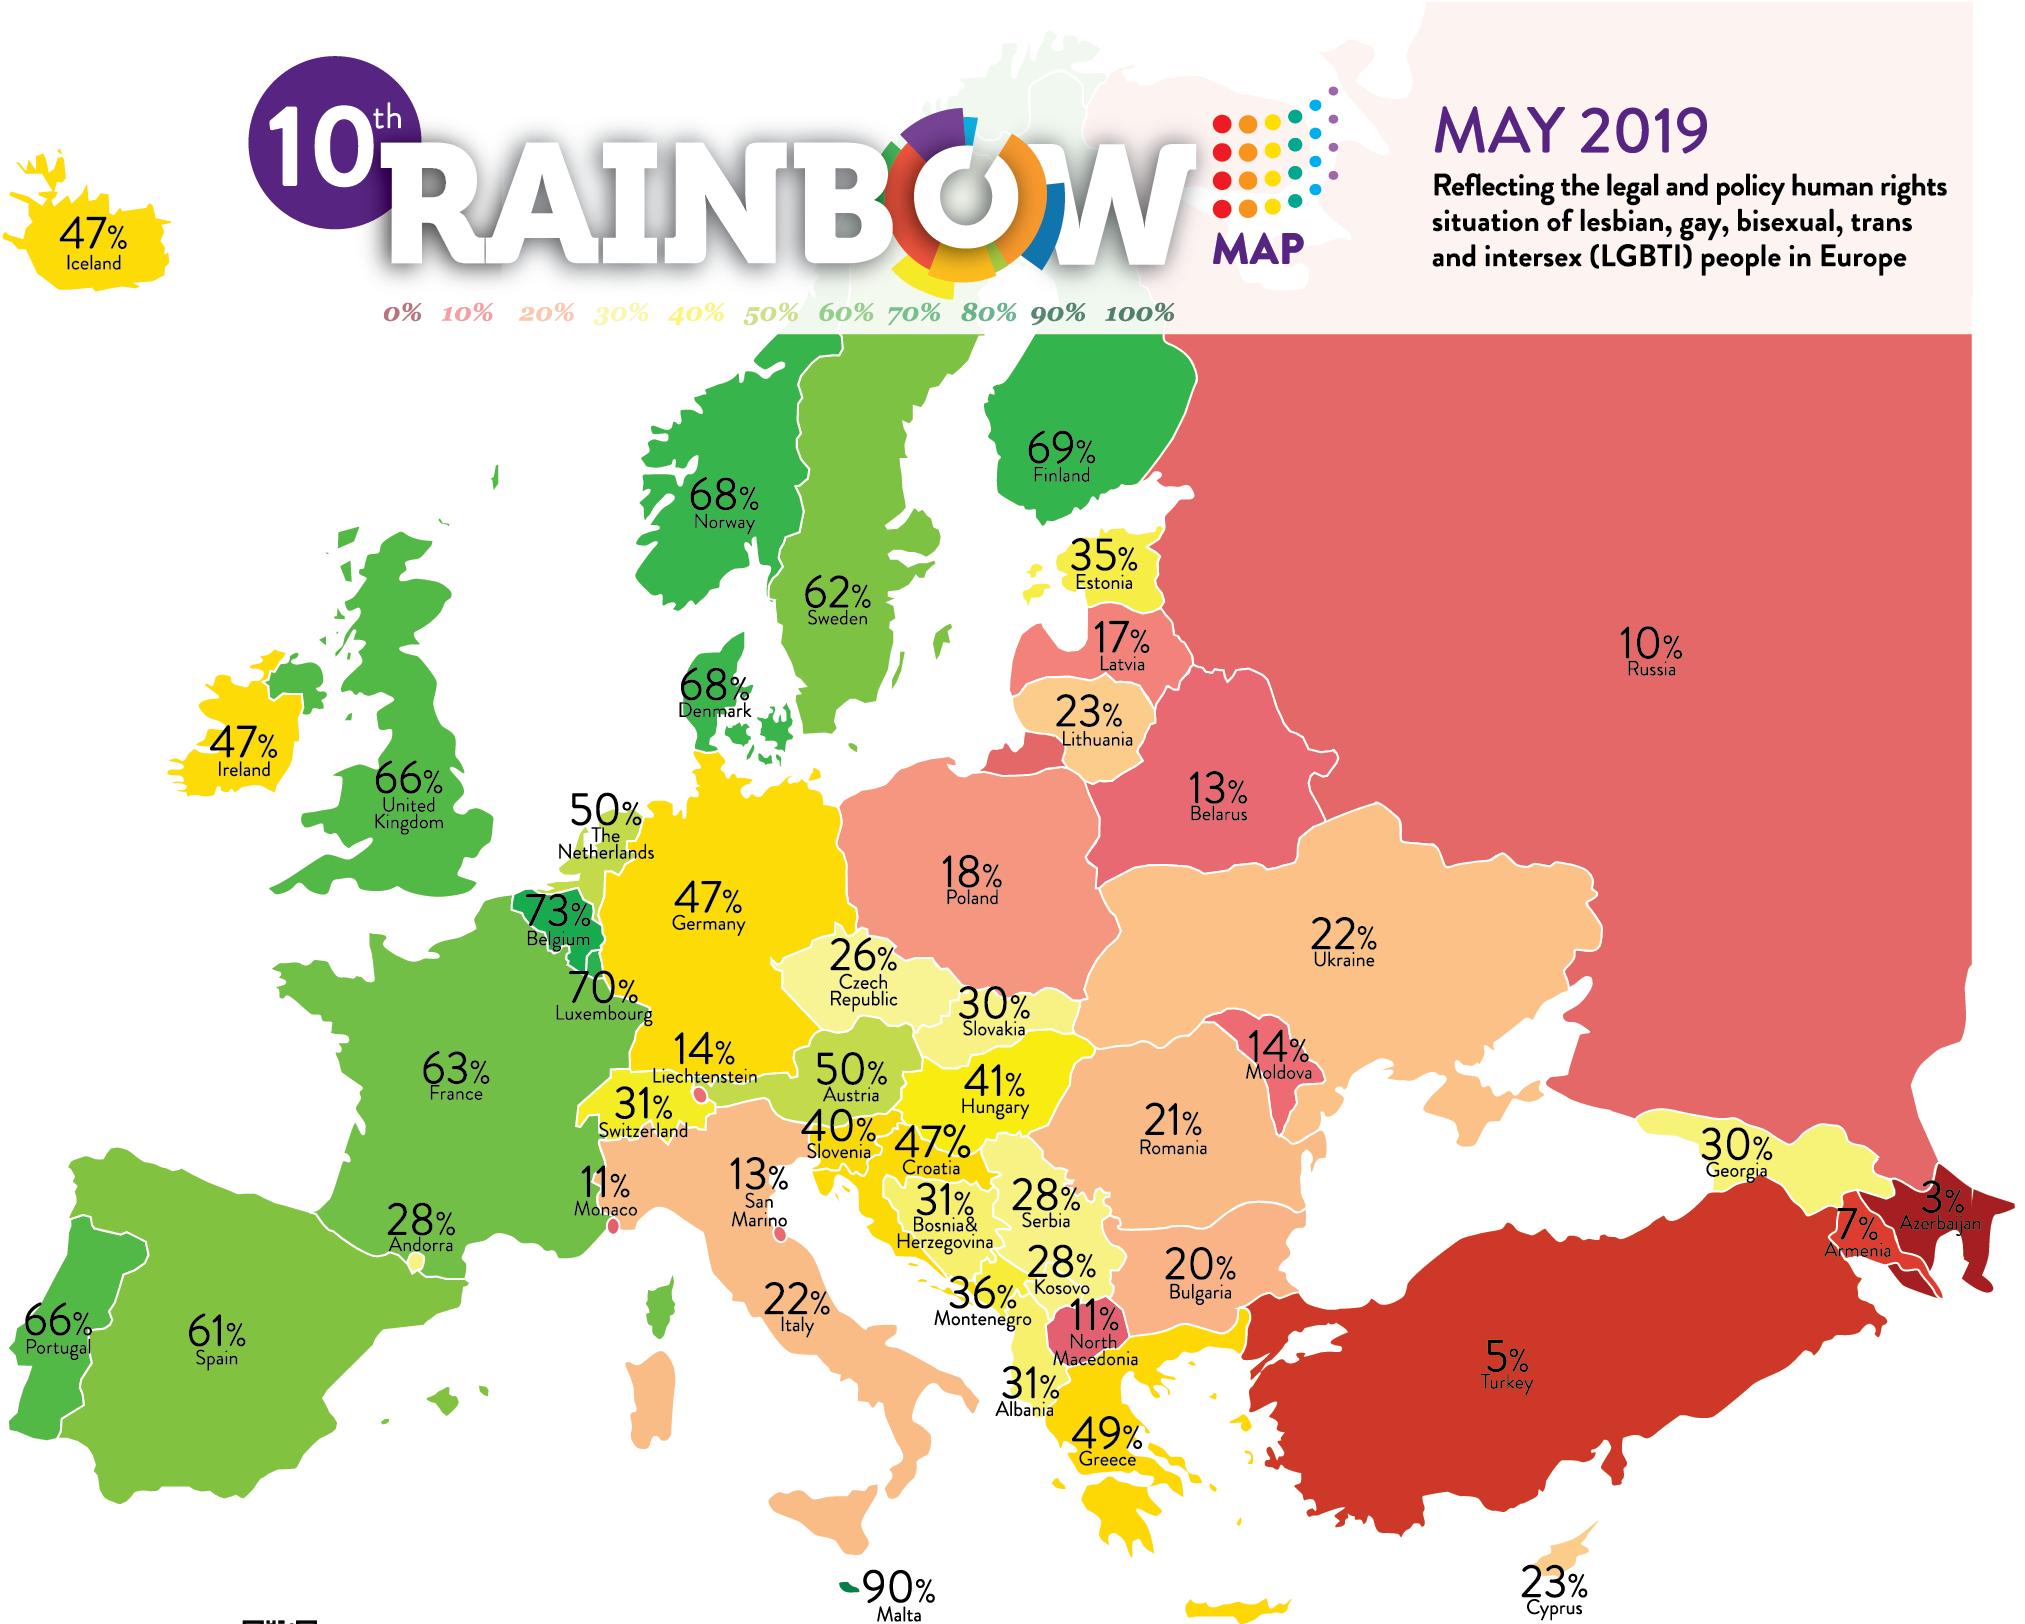 LGBT+ rights: Estonia ranks 21st on Rainbow Europe map